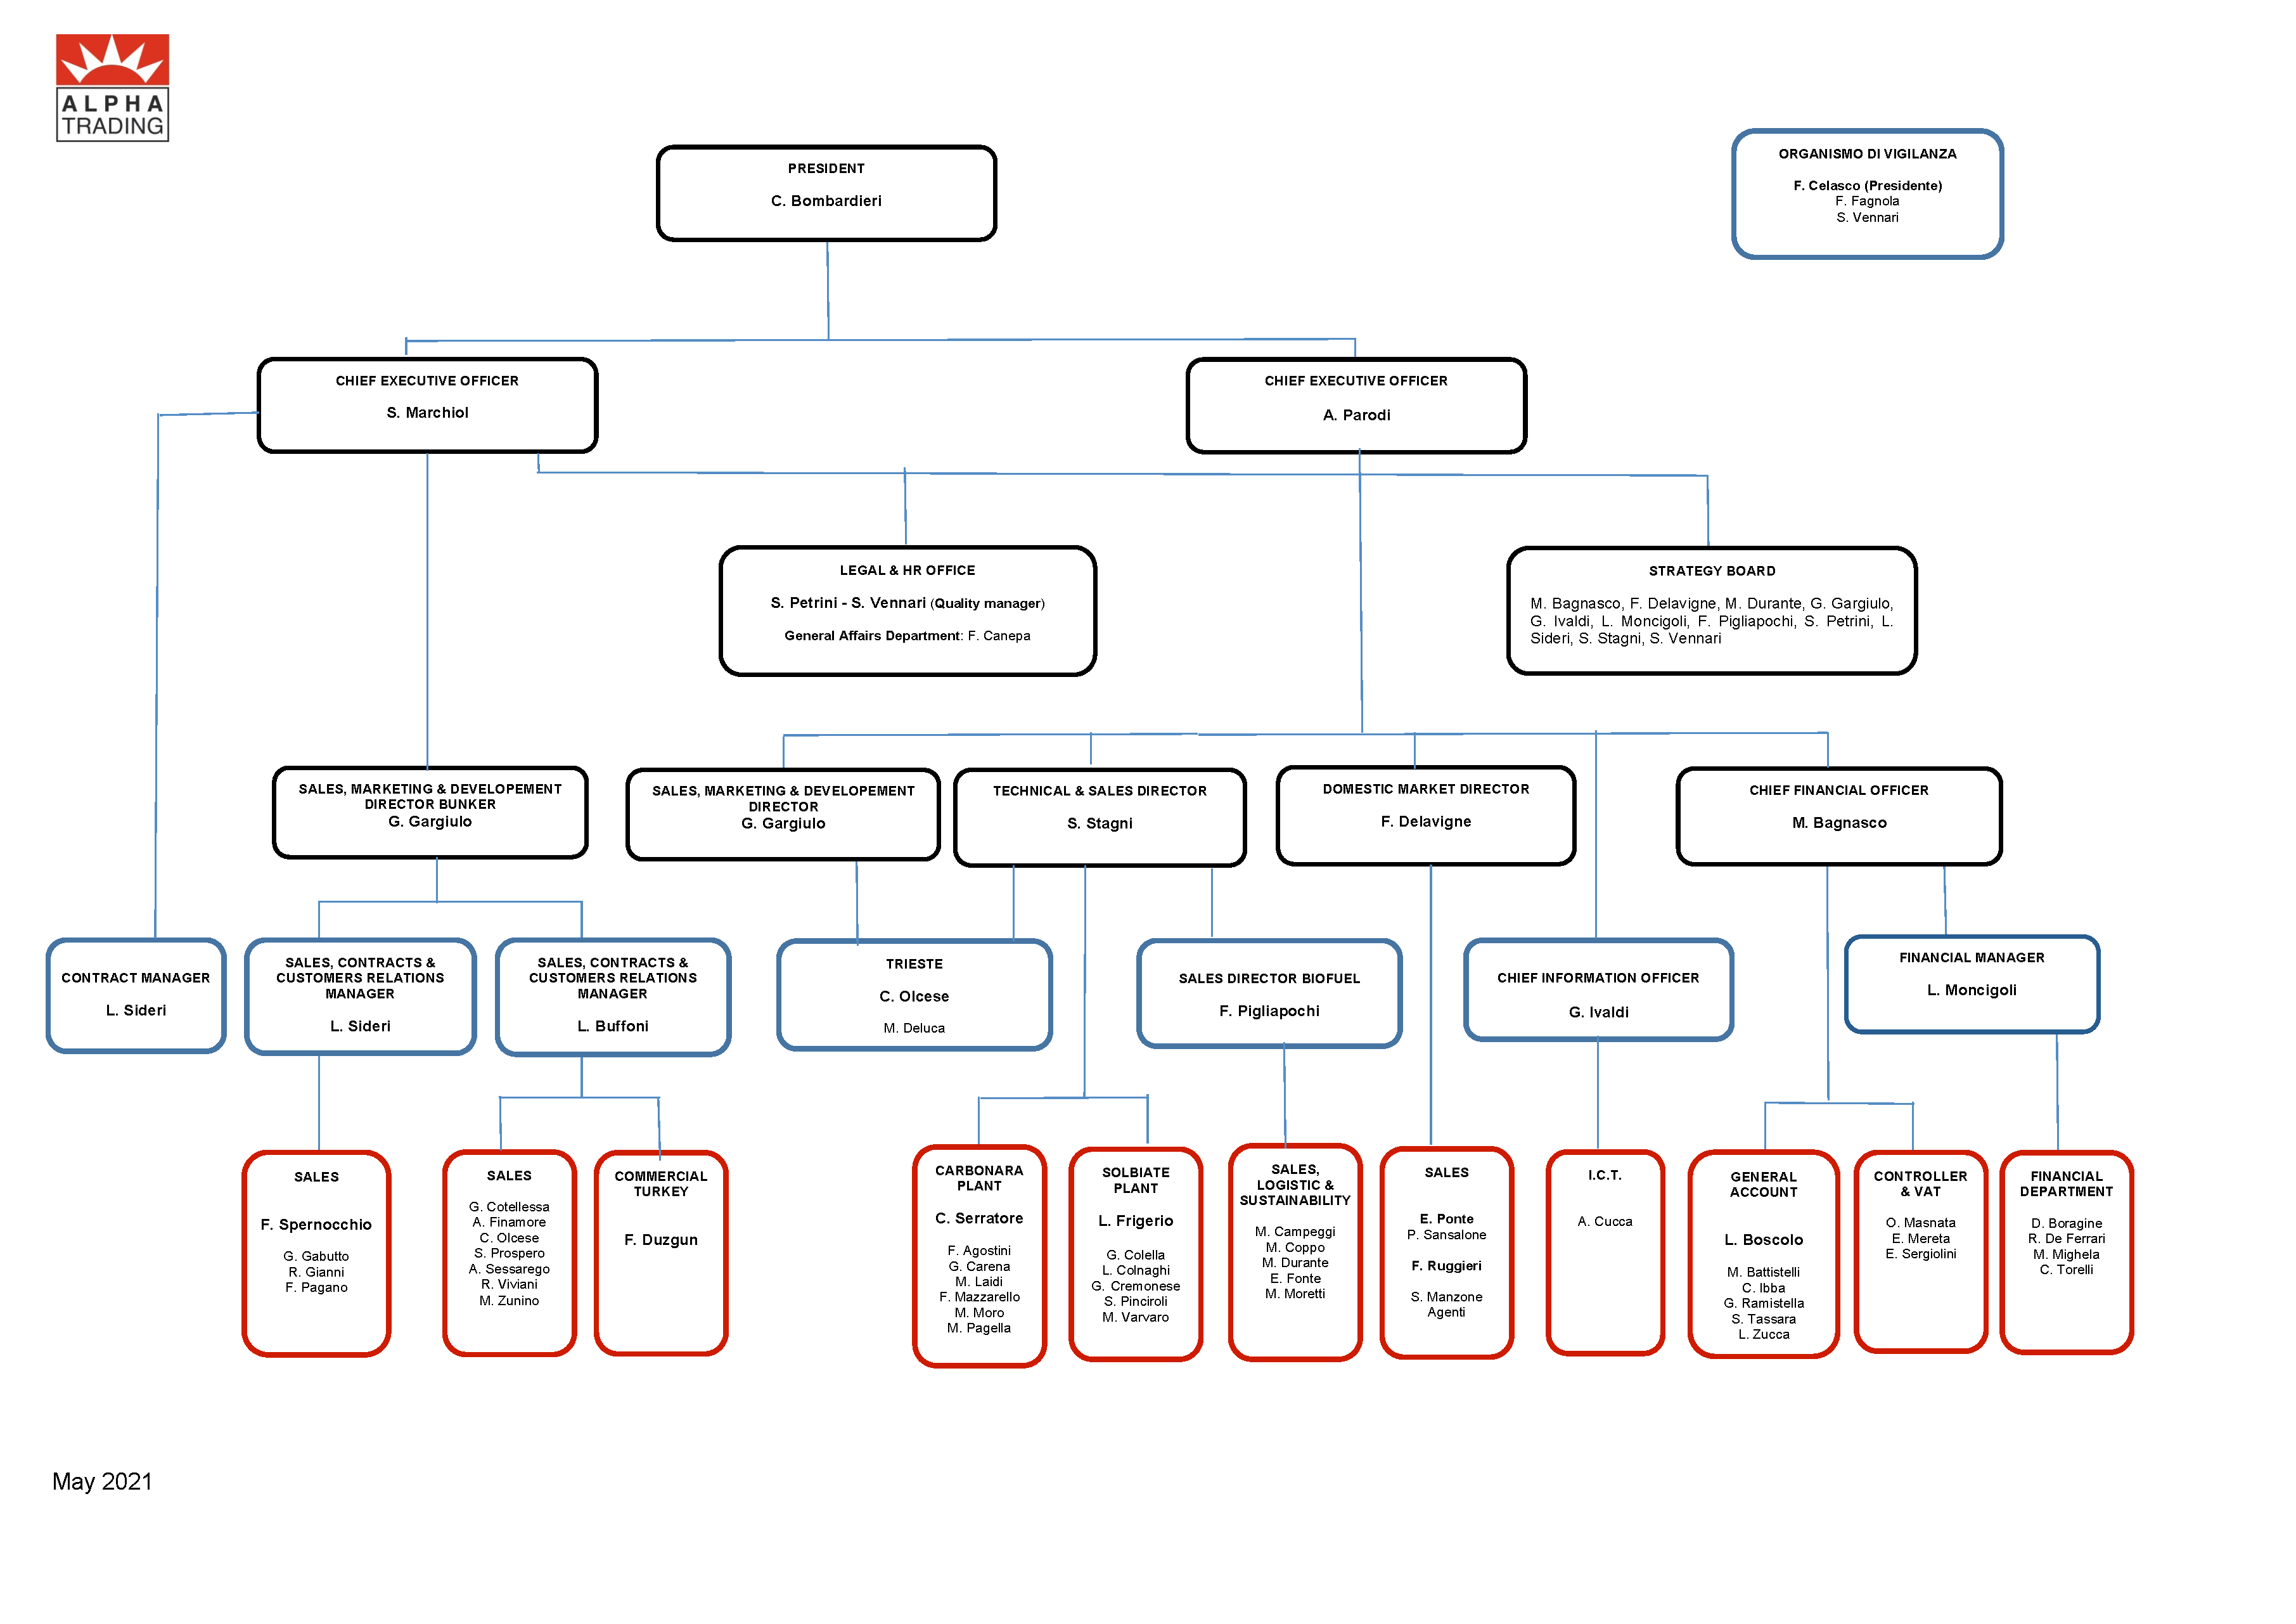 Organigramma AT Maggio 2021 – ENG